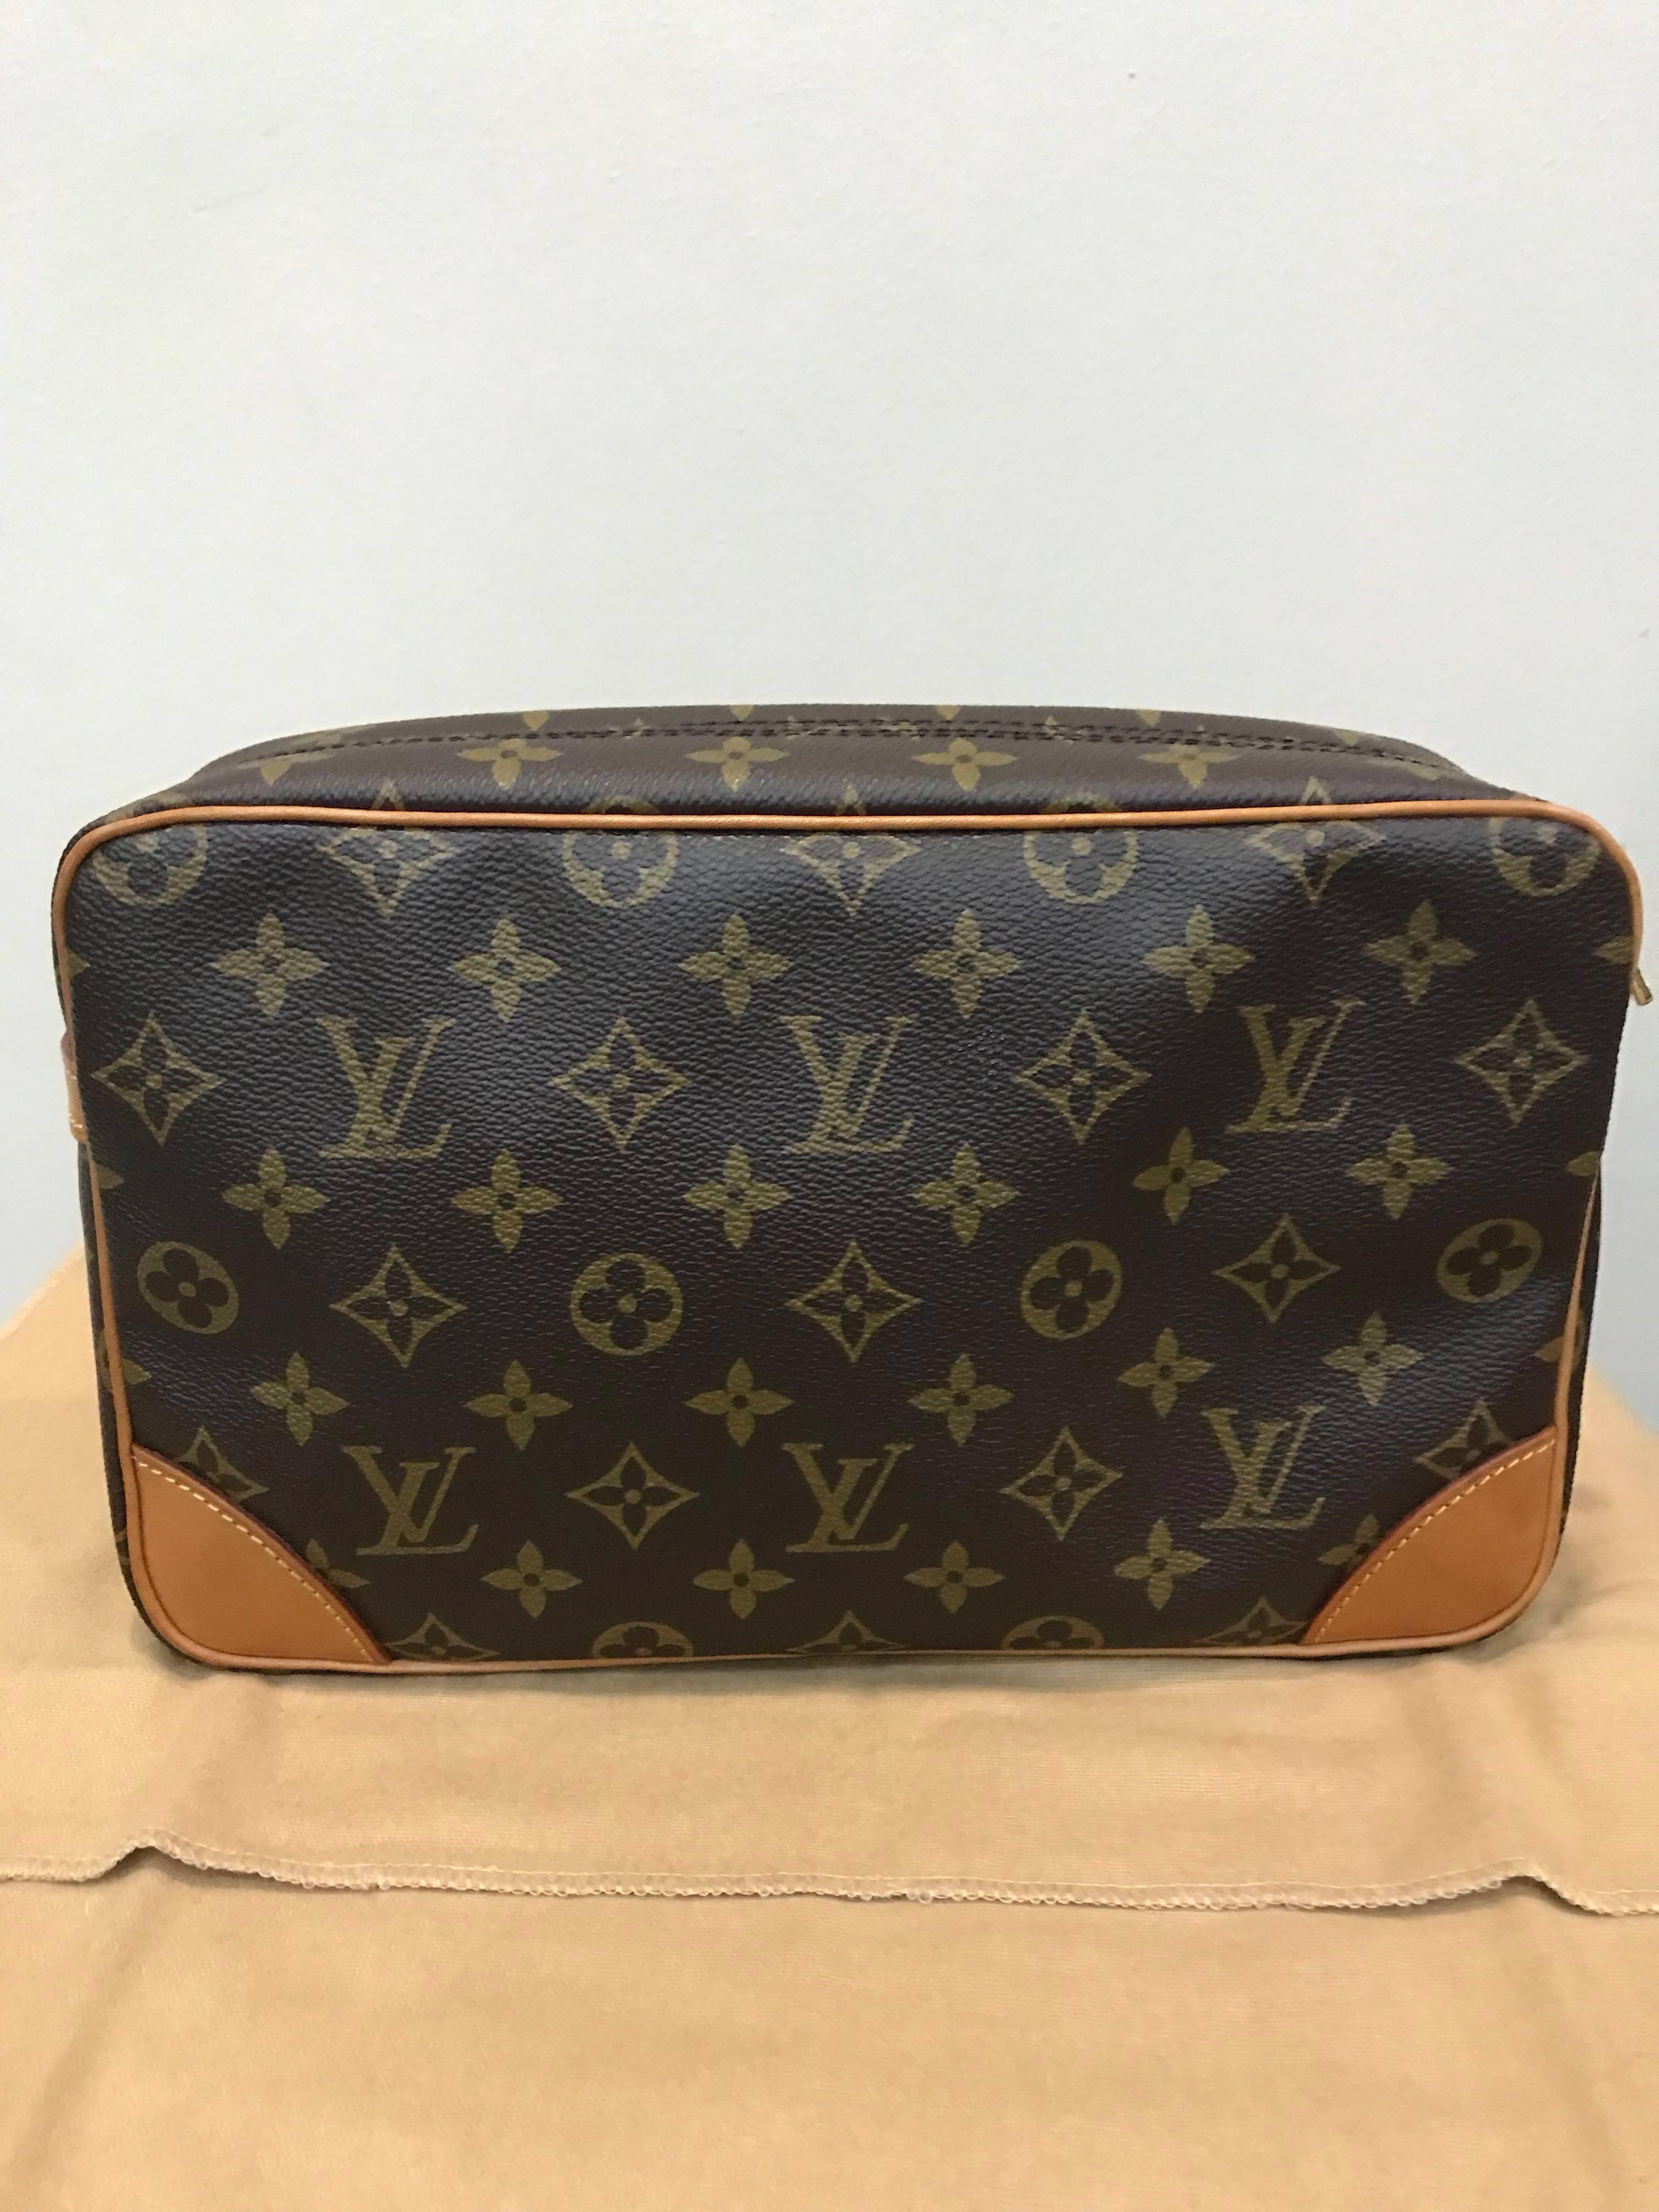 166925ff8b07 Authentic Louis Vuitton Compiegne 28 Clutch   Cosmetic